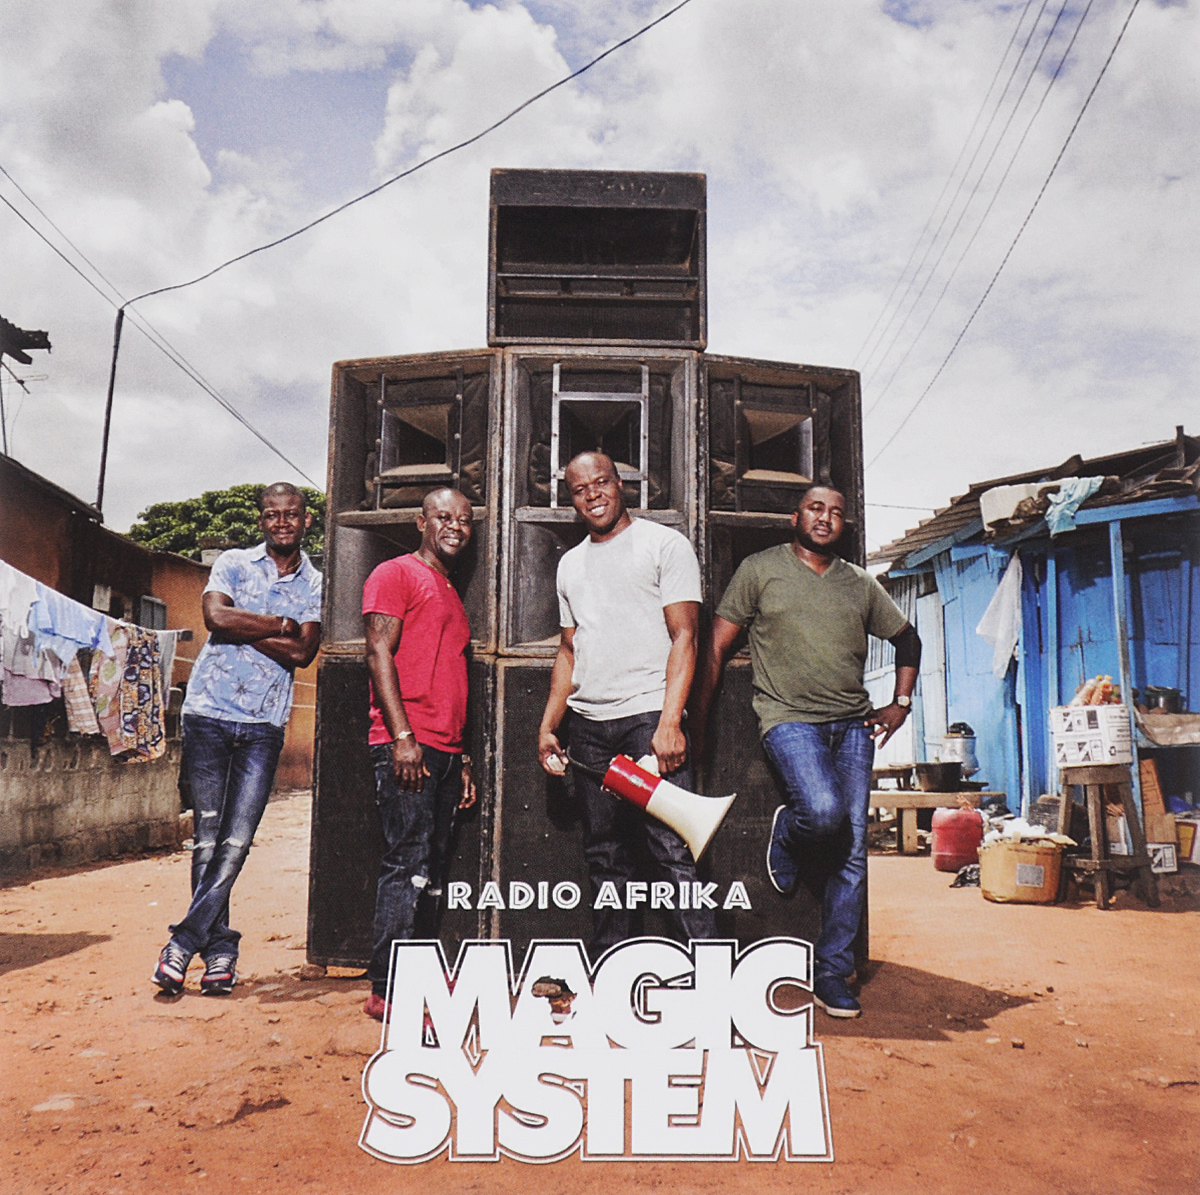 Magic System Magic System. Radio Afrika 12 24vdc 2 speed 2 transmitter 12 channels hoist crane industrial truck radio remote control system controller